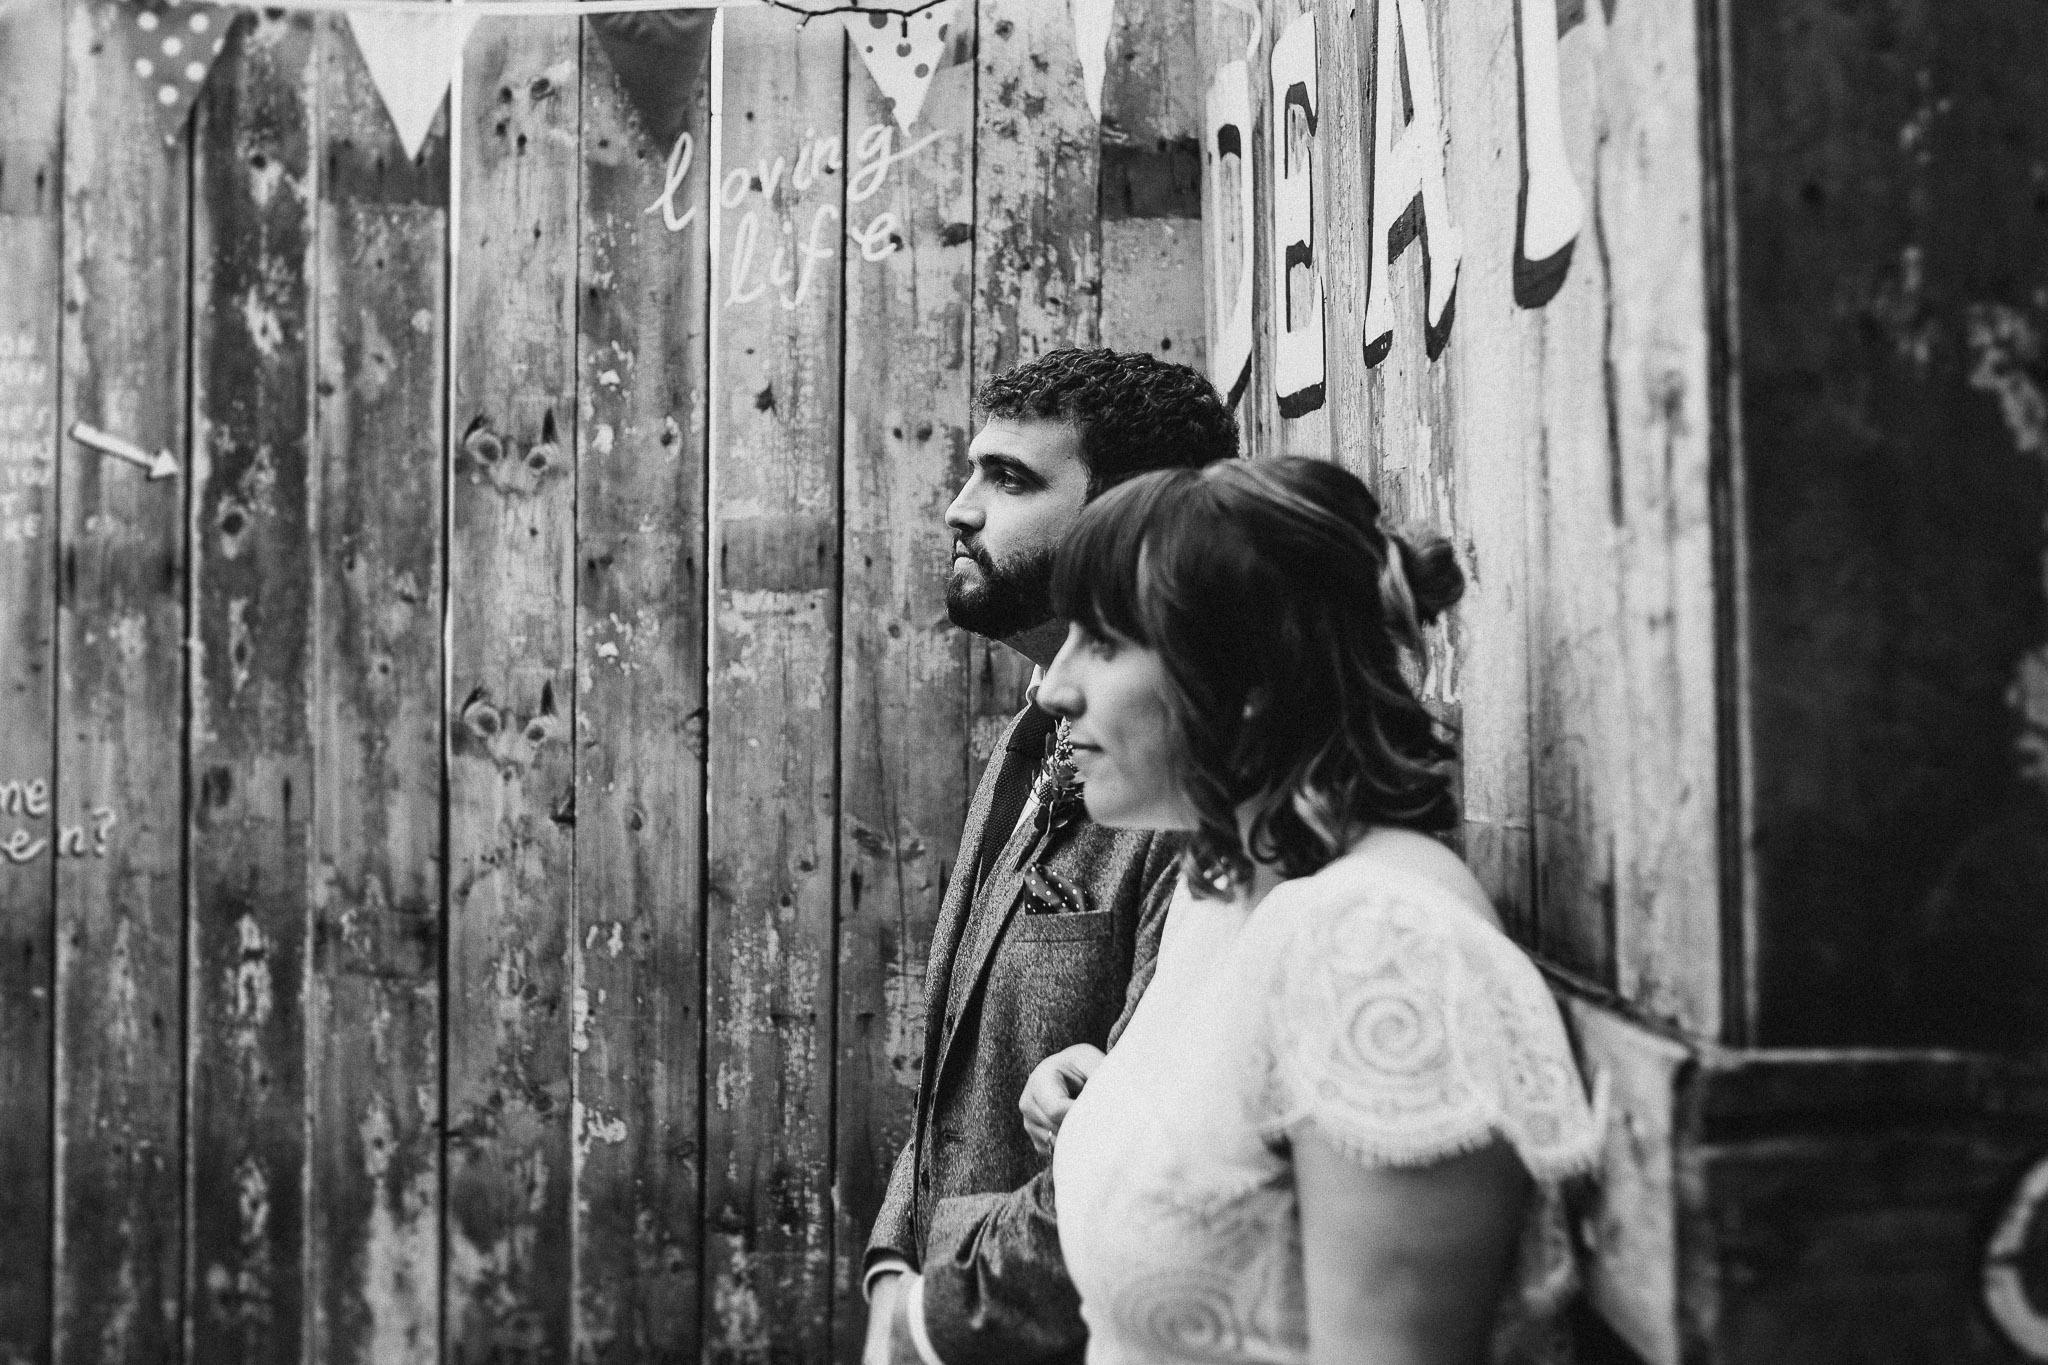 Manchester_Alternative_Wedding_Photographer-45.jpg